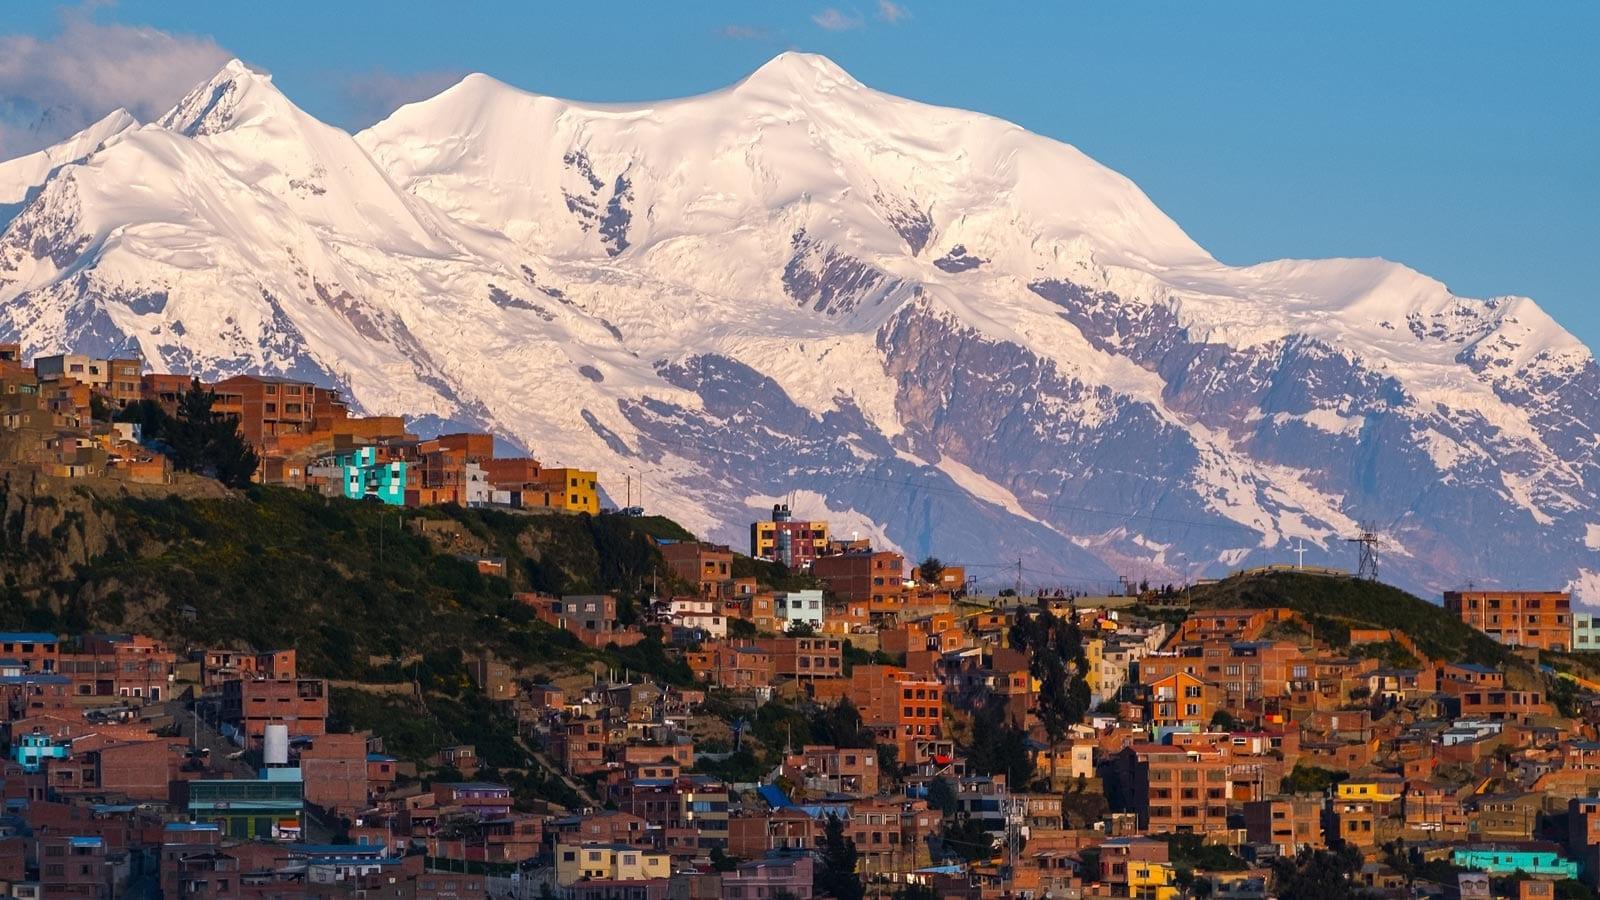 Illiani above La Paz Bolivia